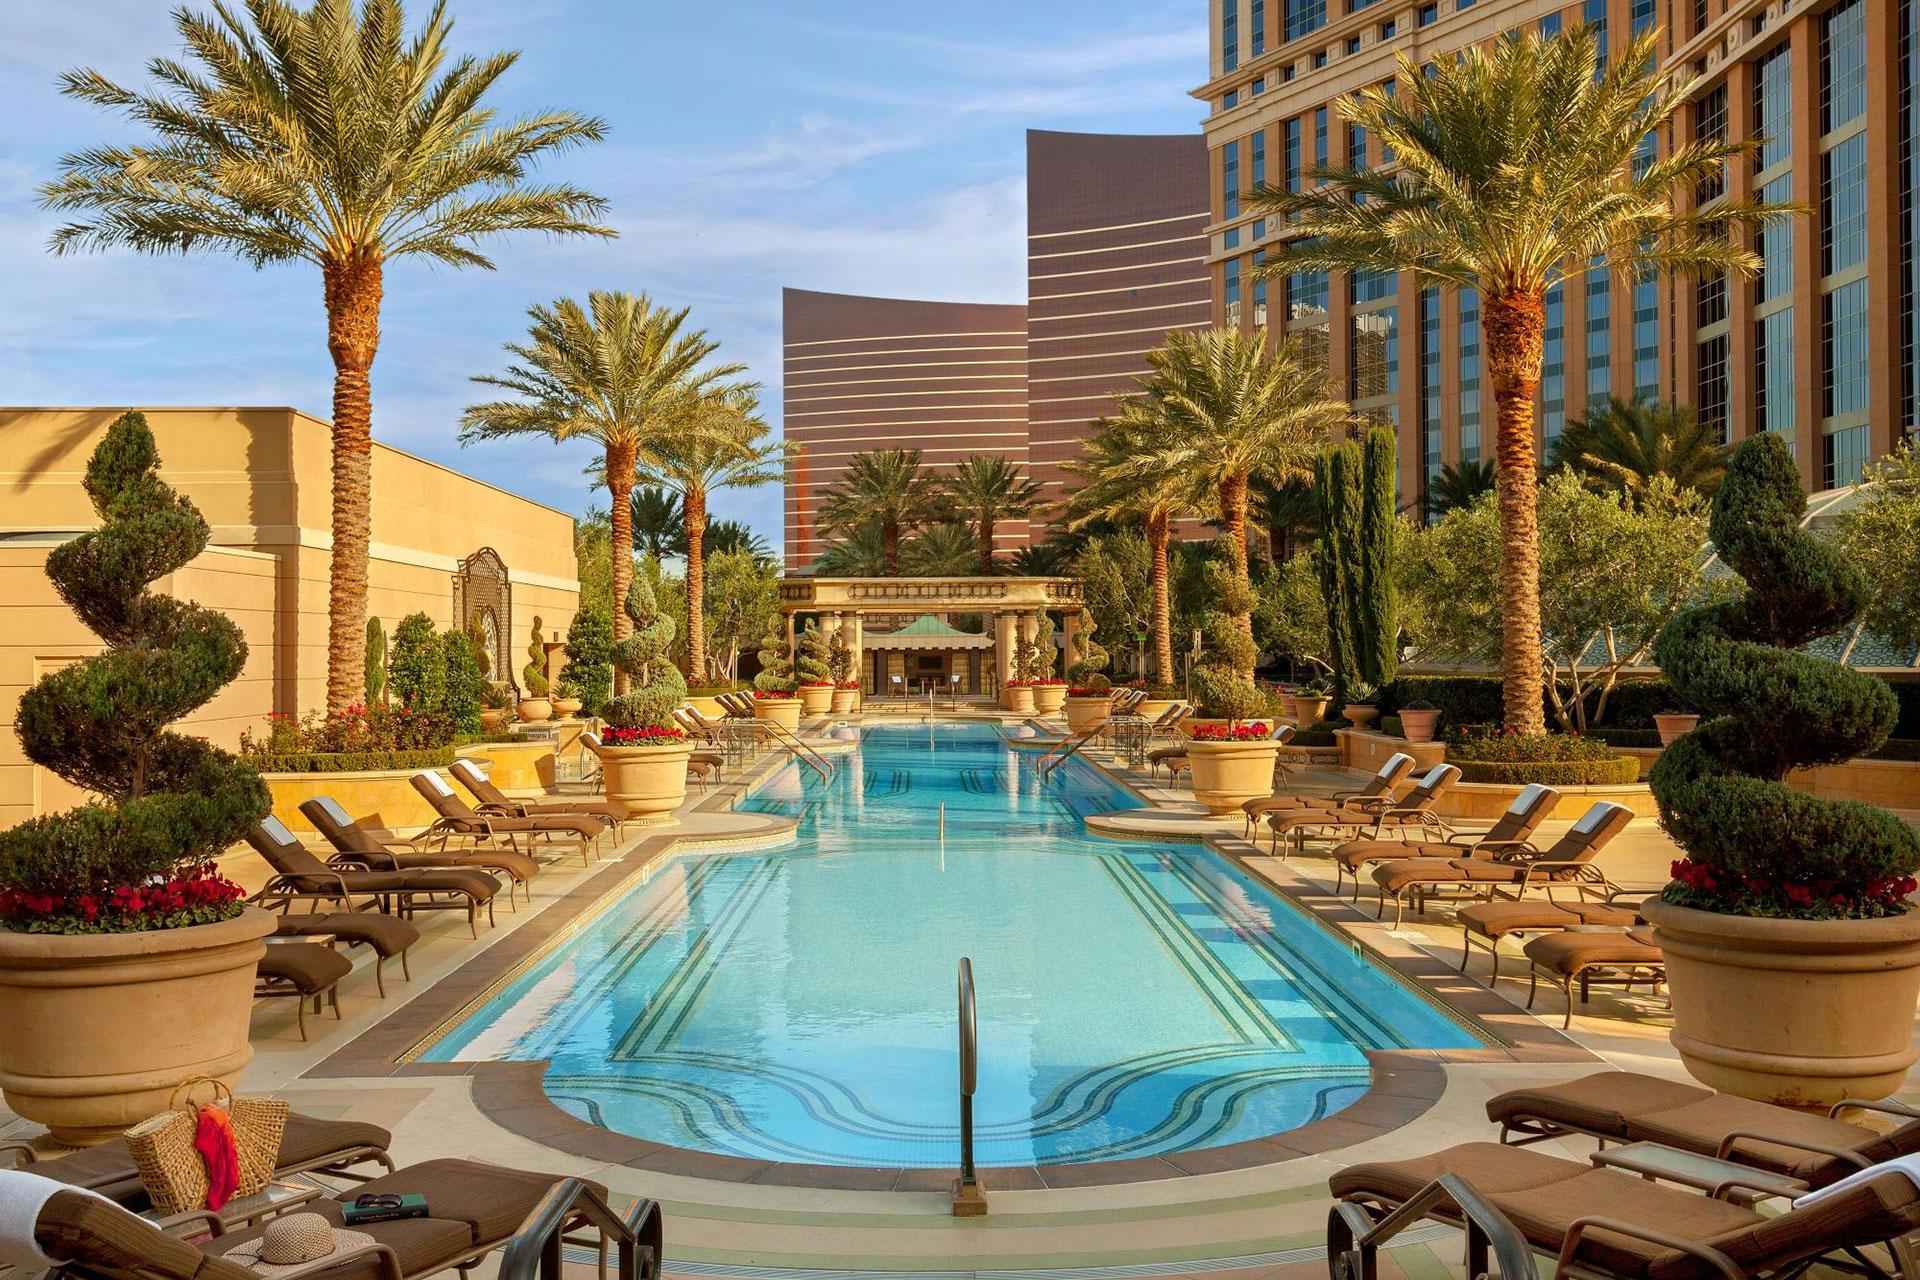 Outdoor Pool at The Palazzo Resort Hotel Casino in Las Vegas